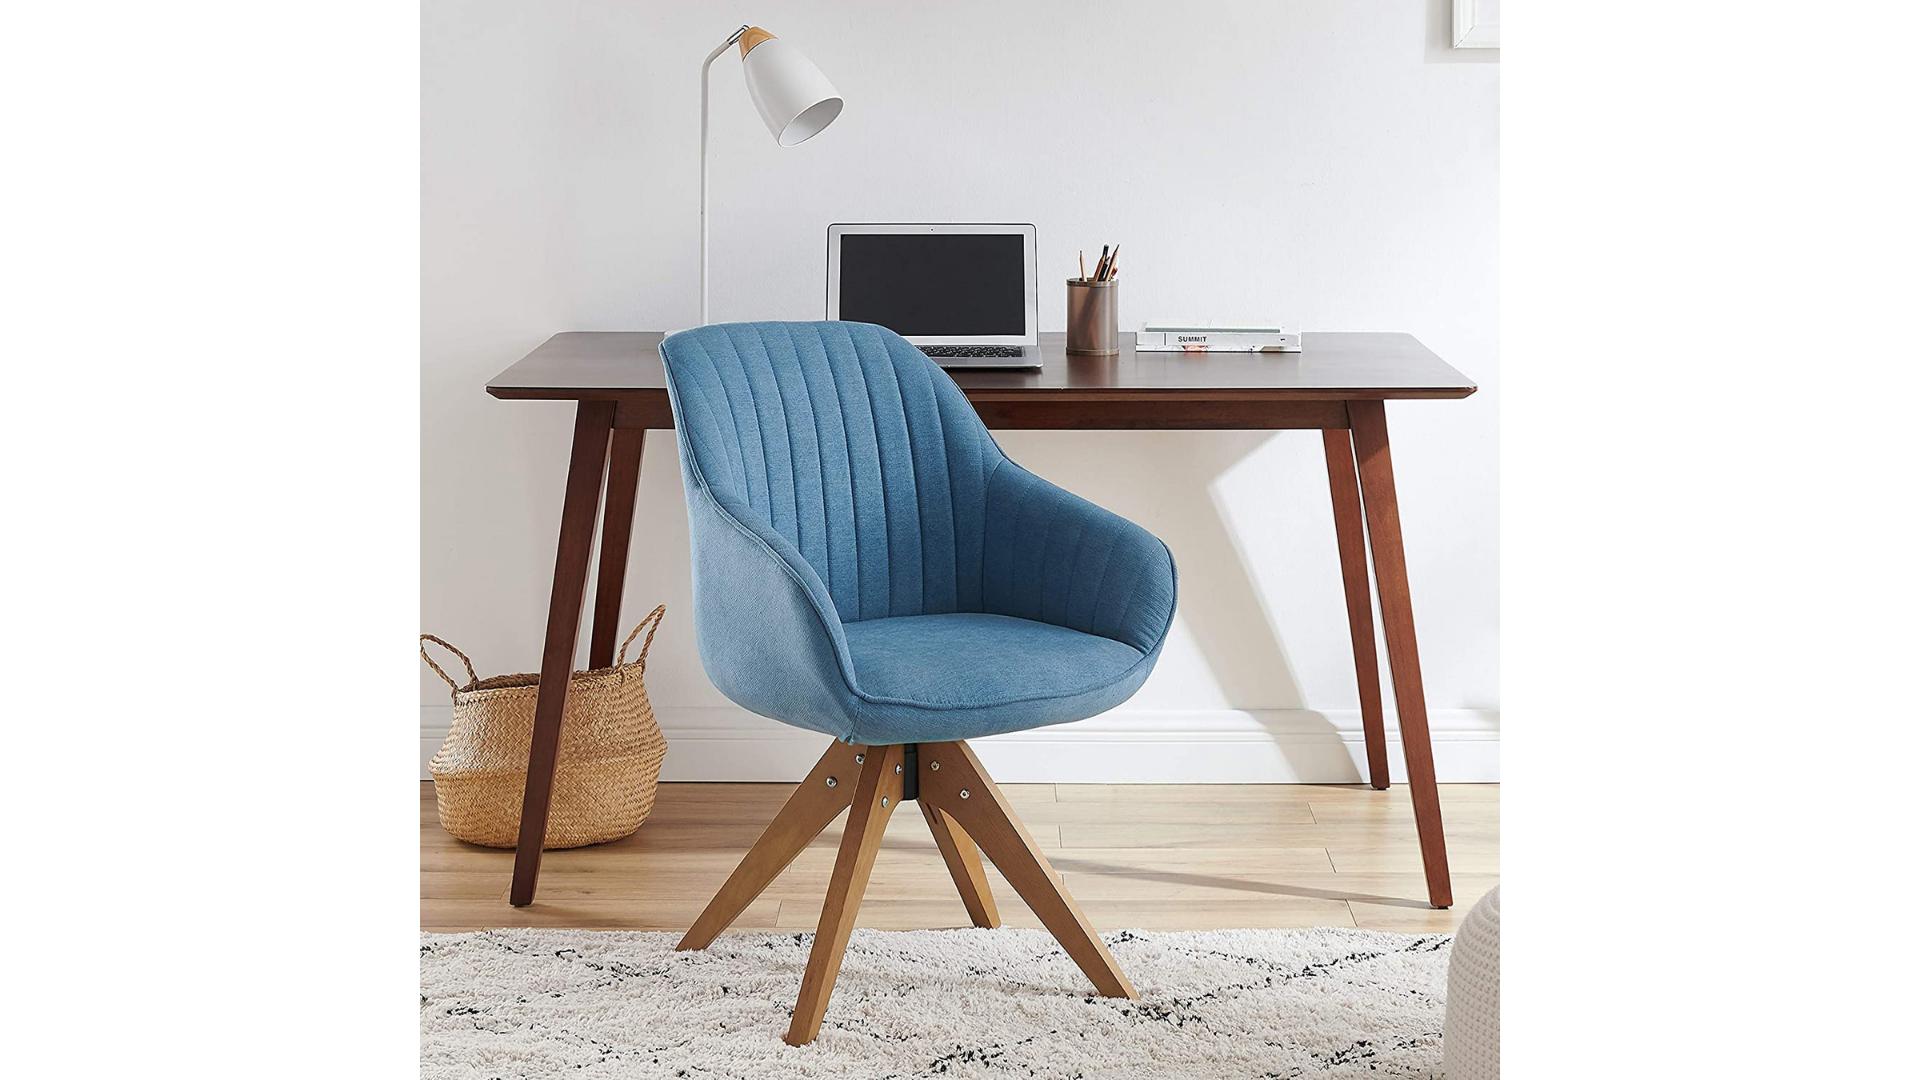 Art Leon best desk chair with no wheels